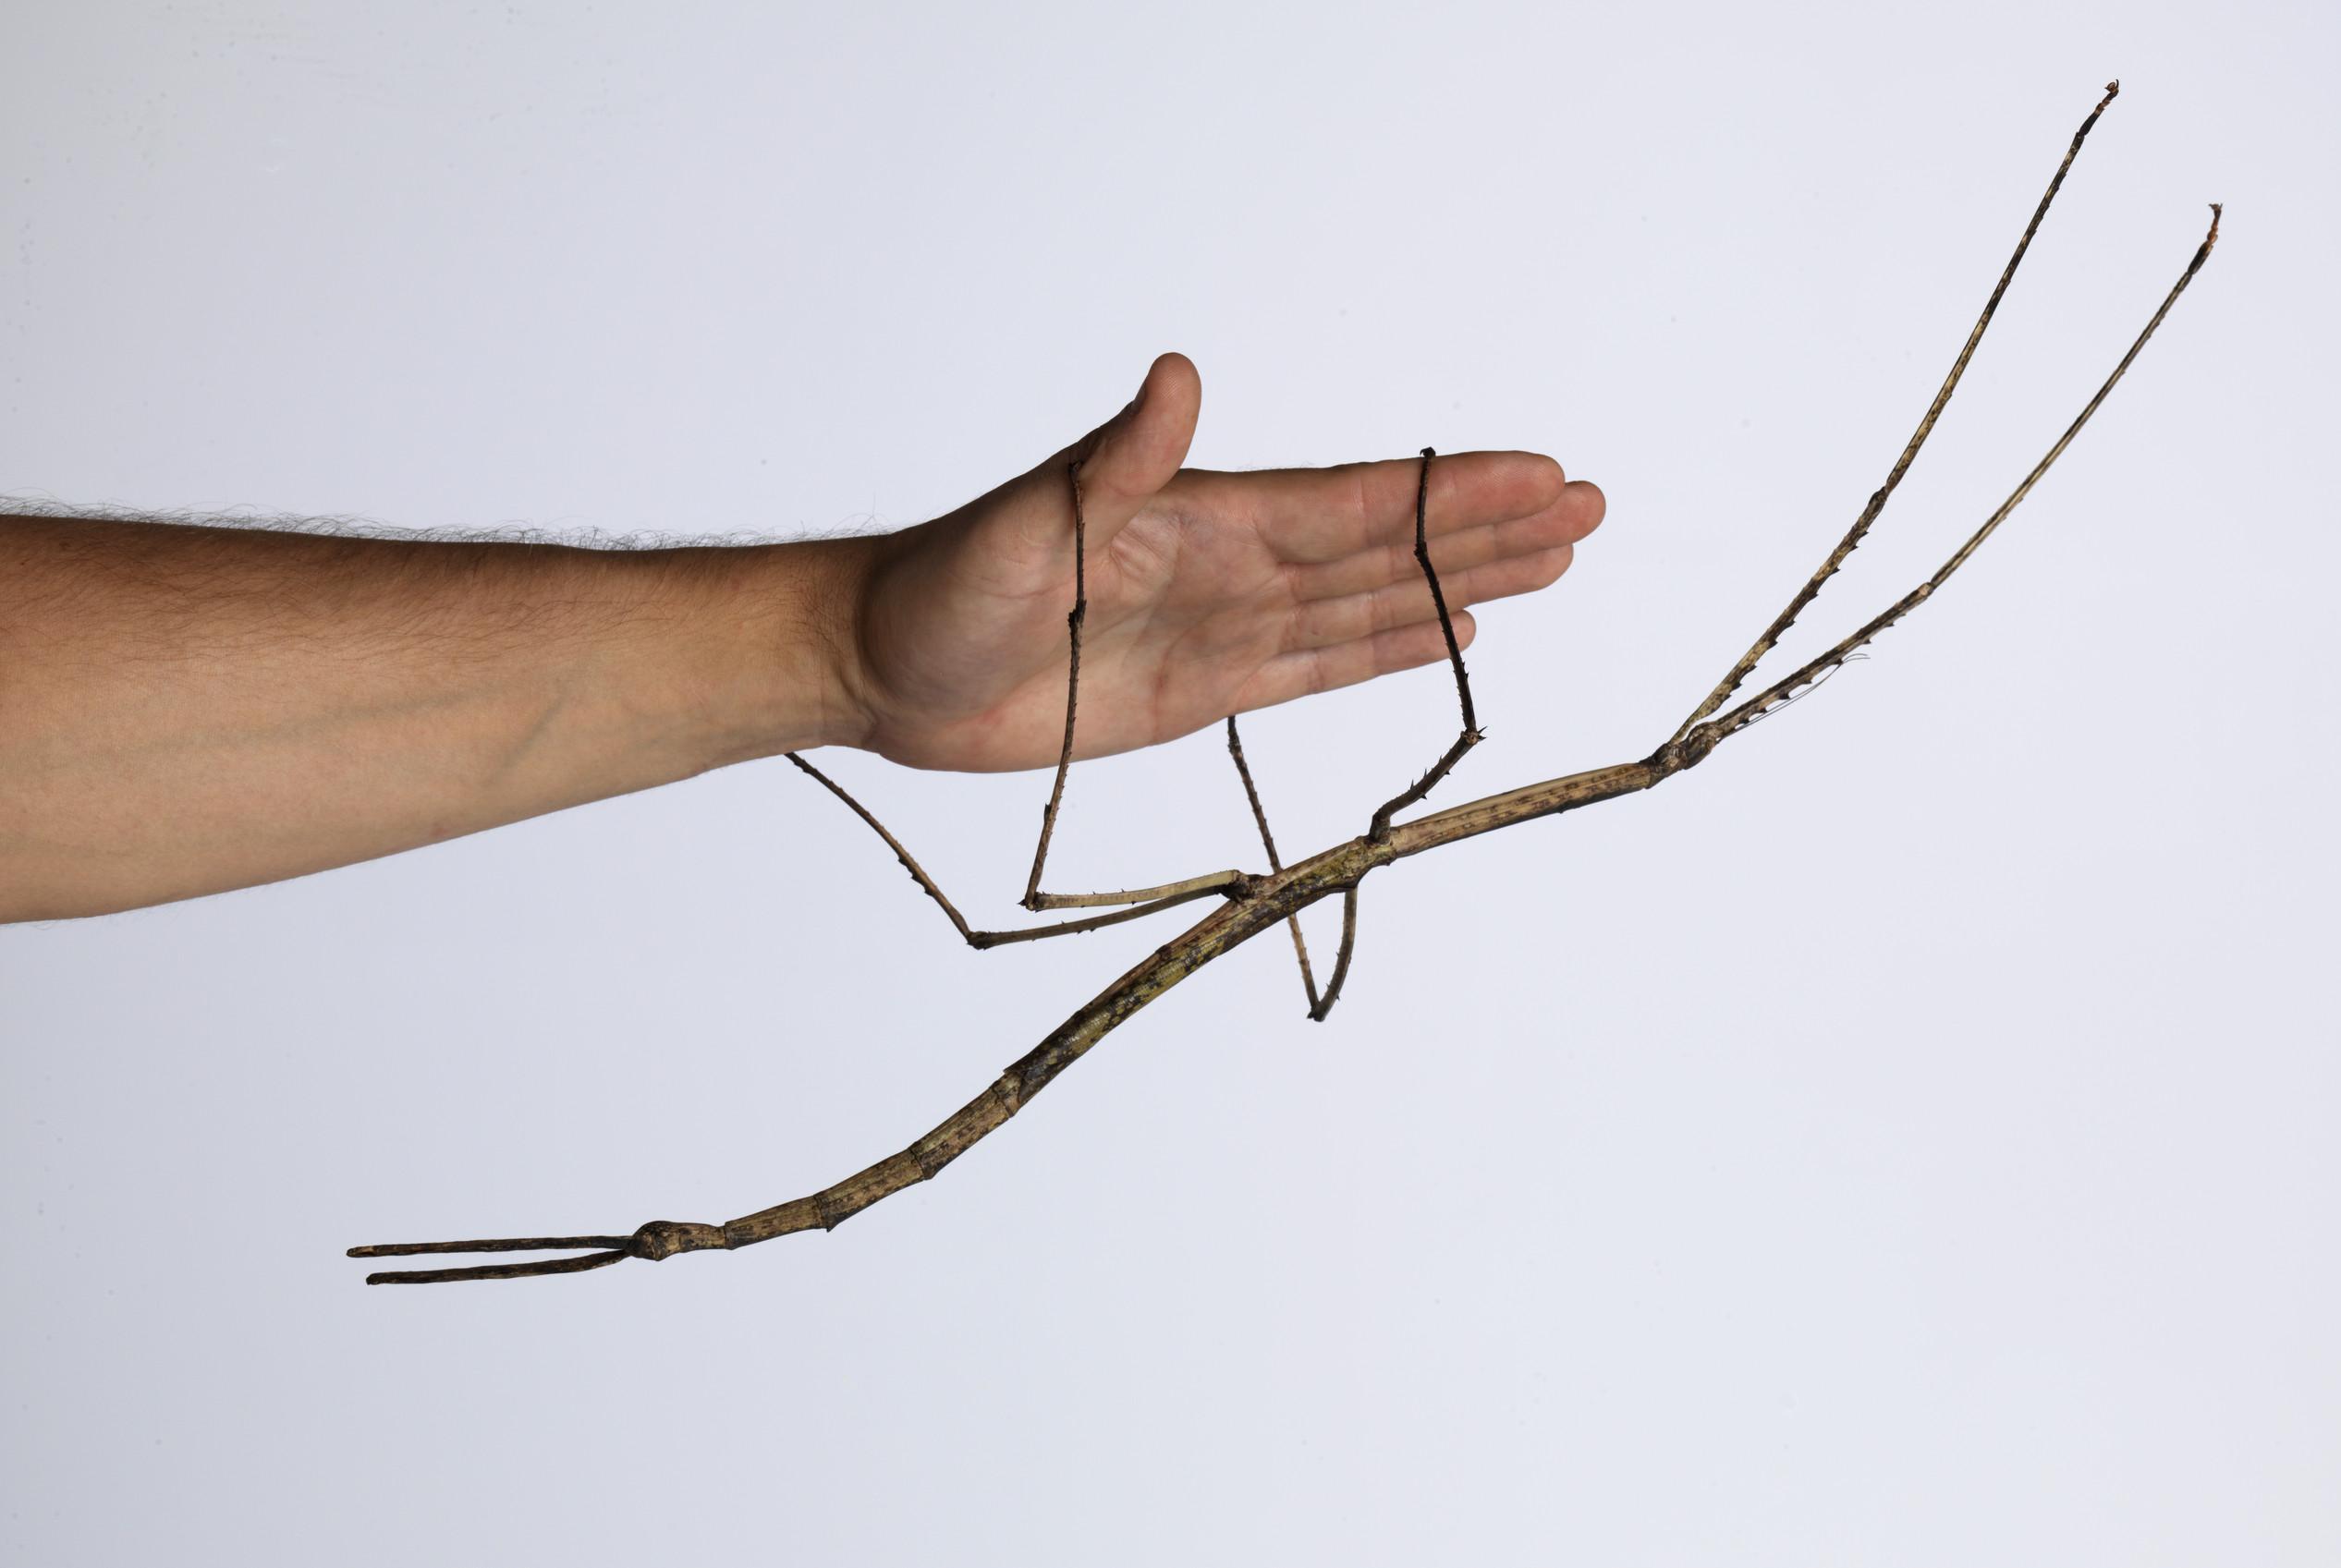 Gargantuan Aussie Stick Insect Has Babies In A World First